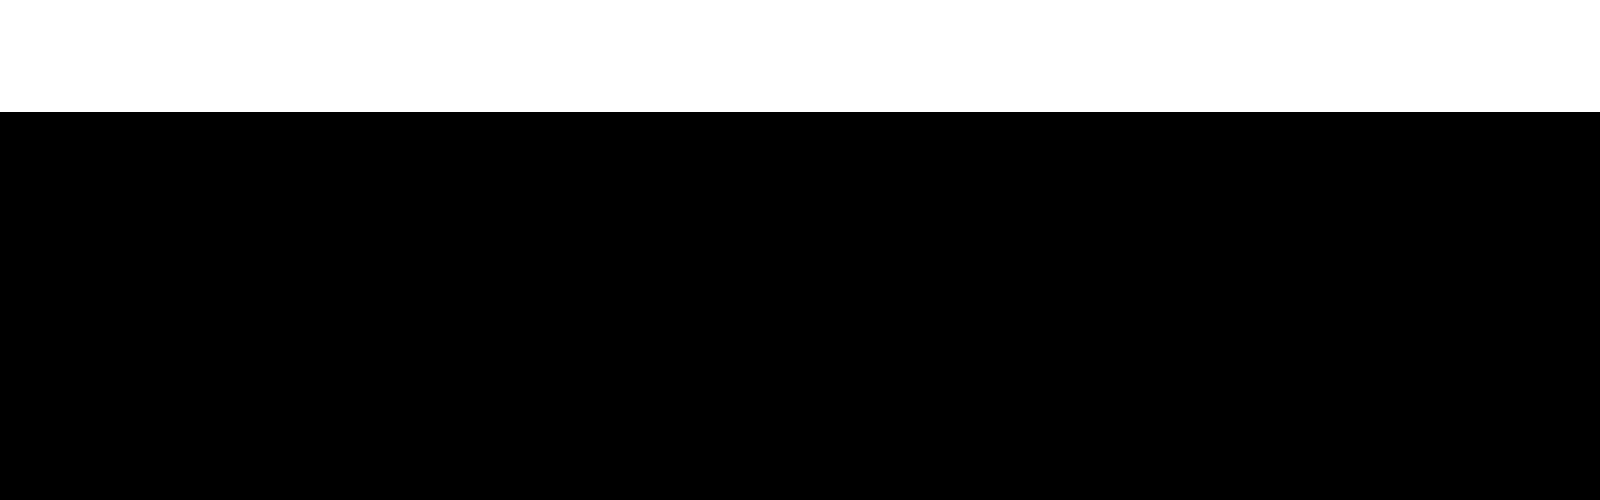 Black-Bottom-Fade